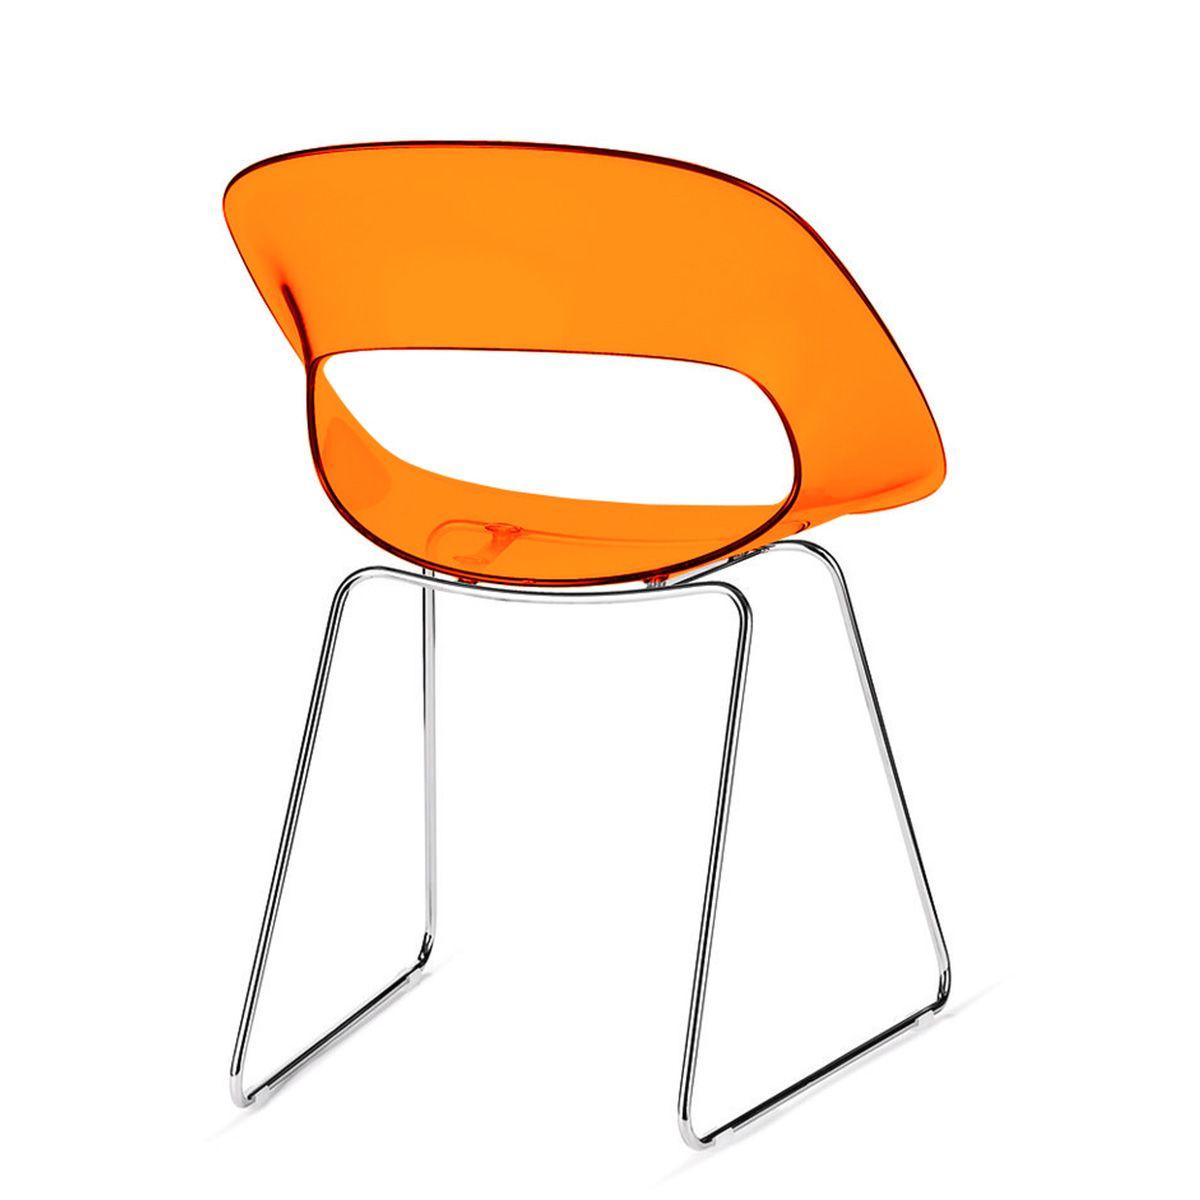 Sedie In Plastica Trasparente | Sedia In Plastica Trasparente Titi 39